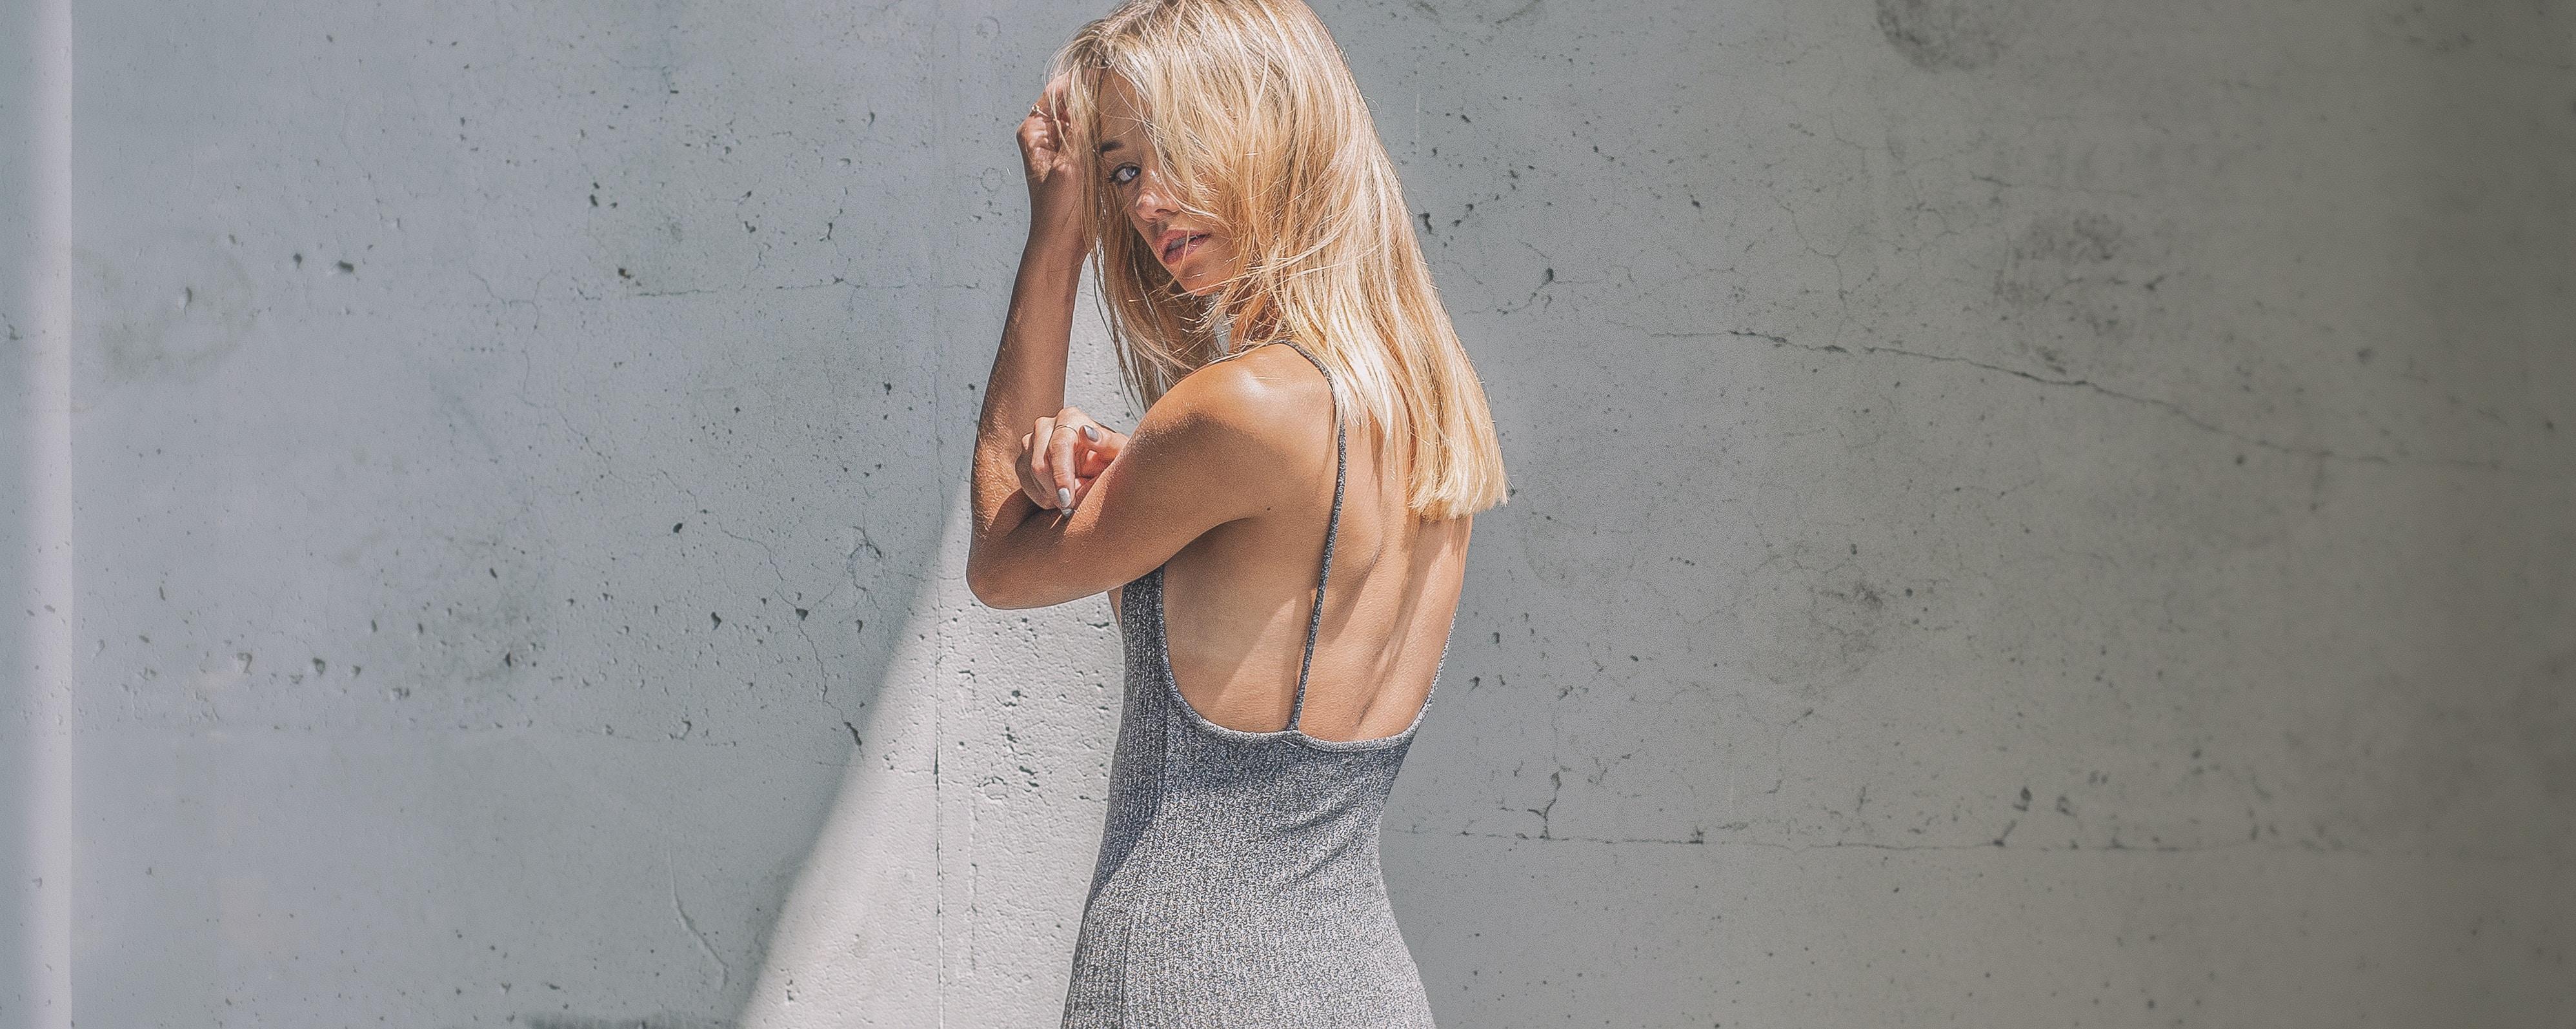 woman in gray sleeveless dress turn head on her left side